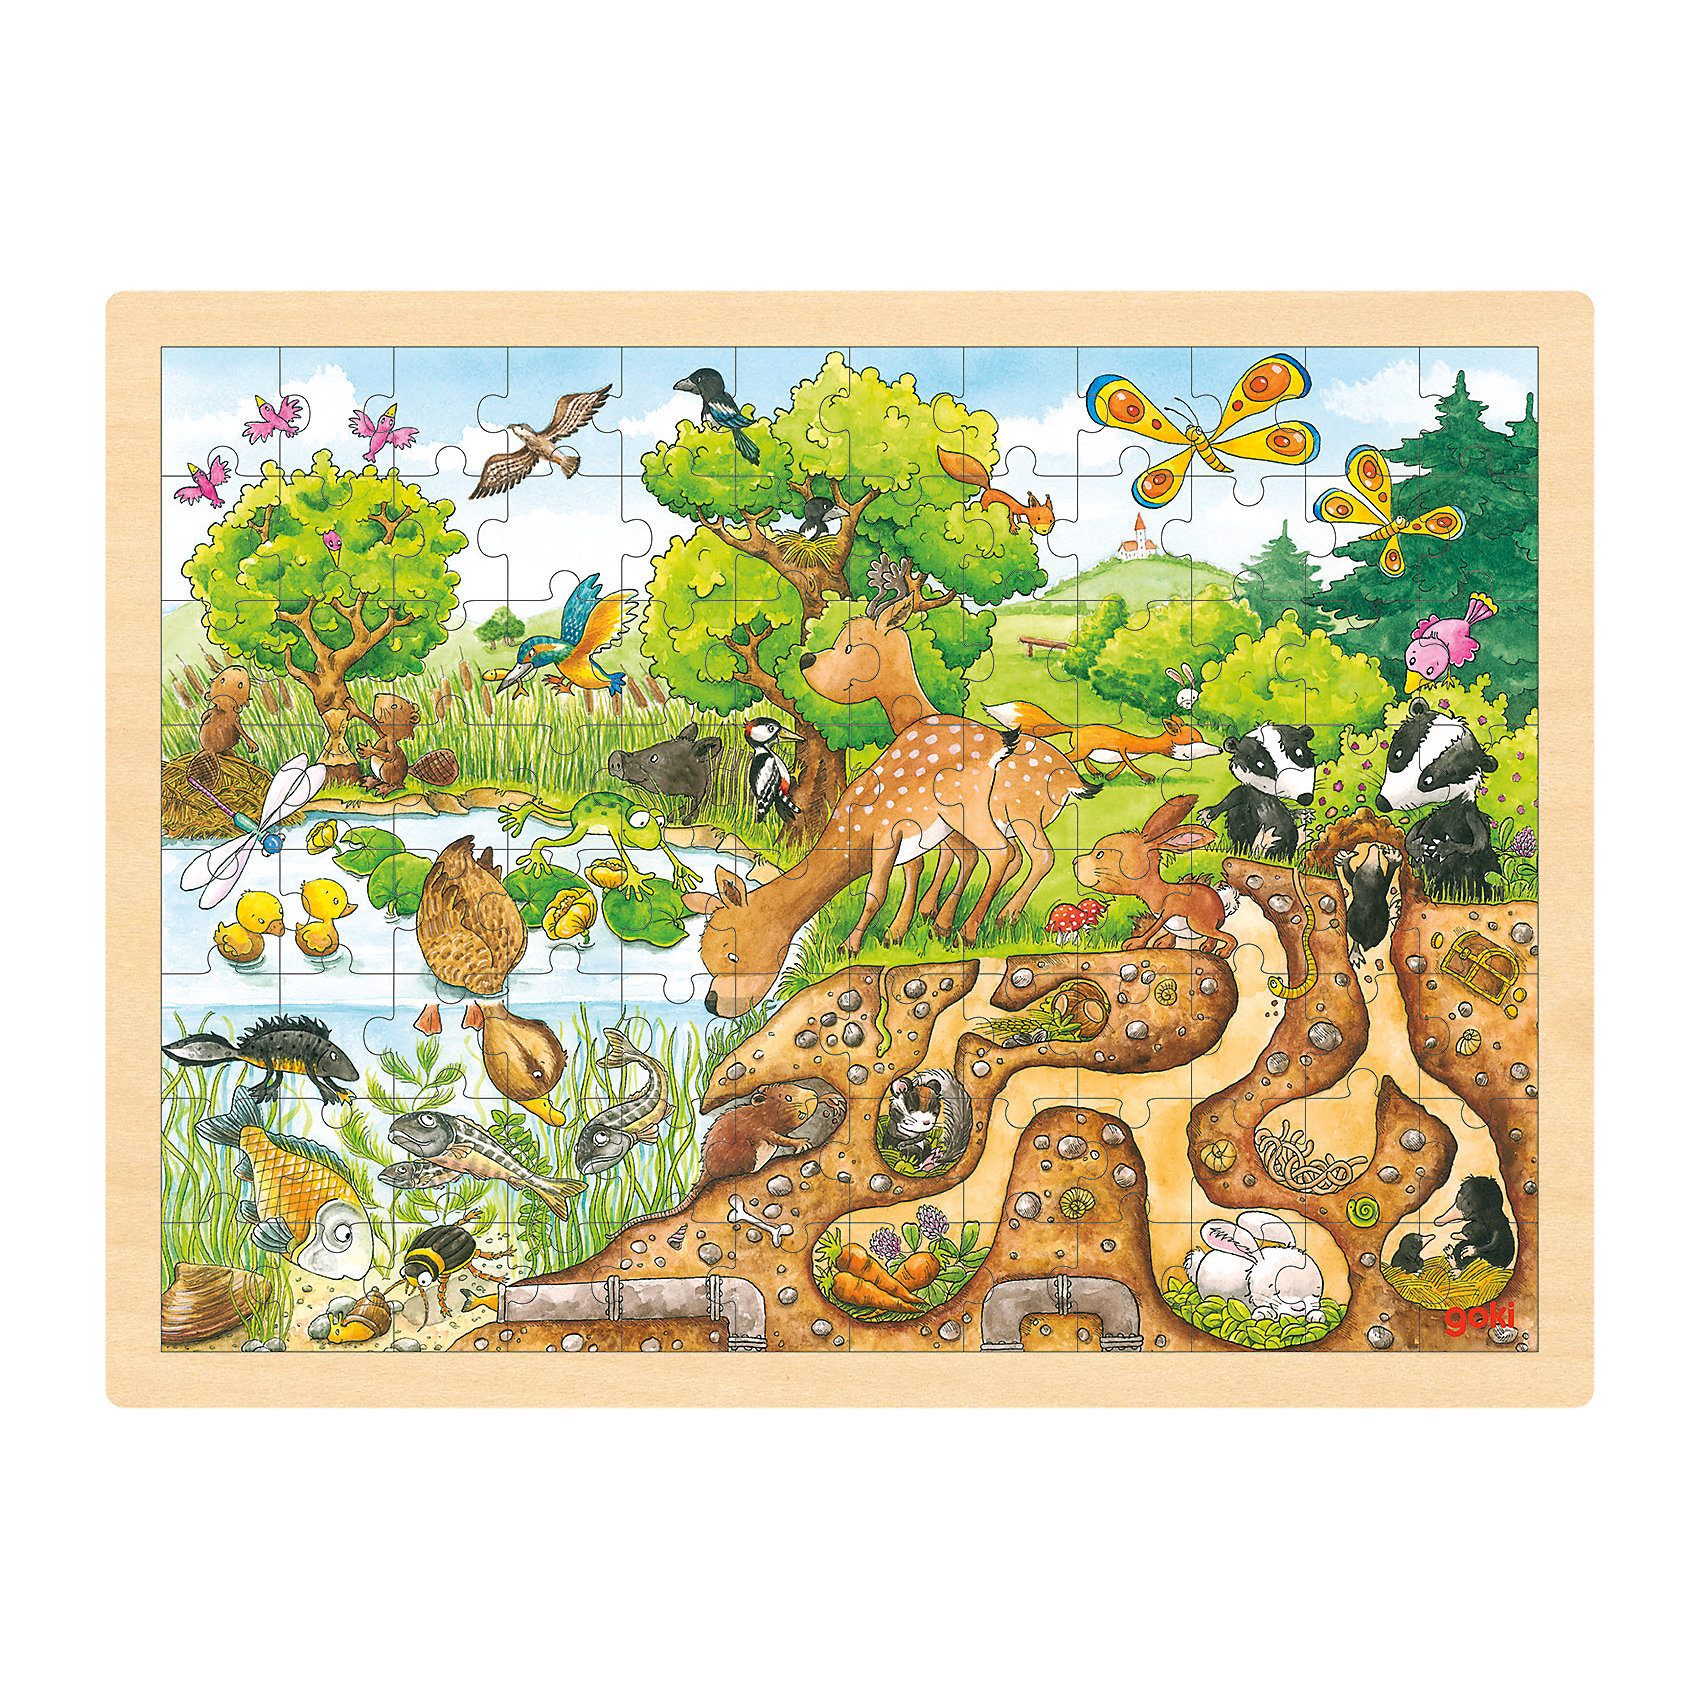 goki Пазл Юный натуралист, 96 дет., goki пазлы magic pazle объемный 3d пазл эйфелева башня 78x38x35 см